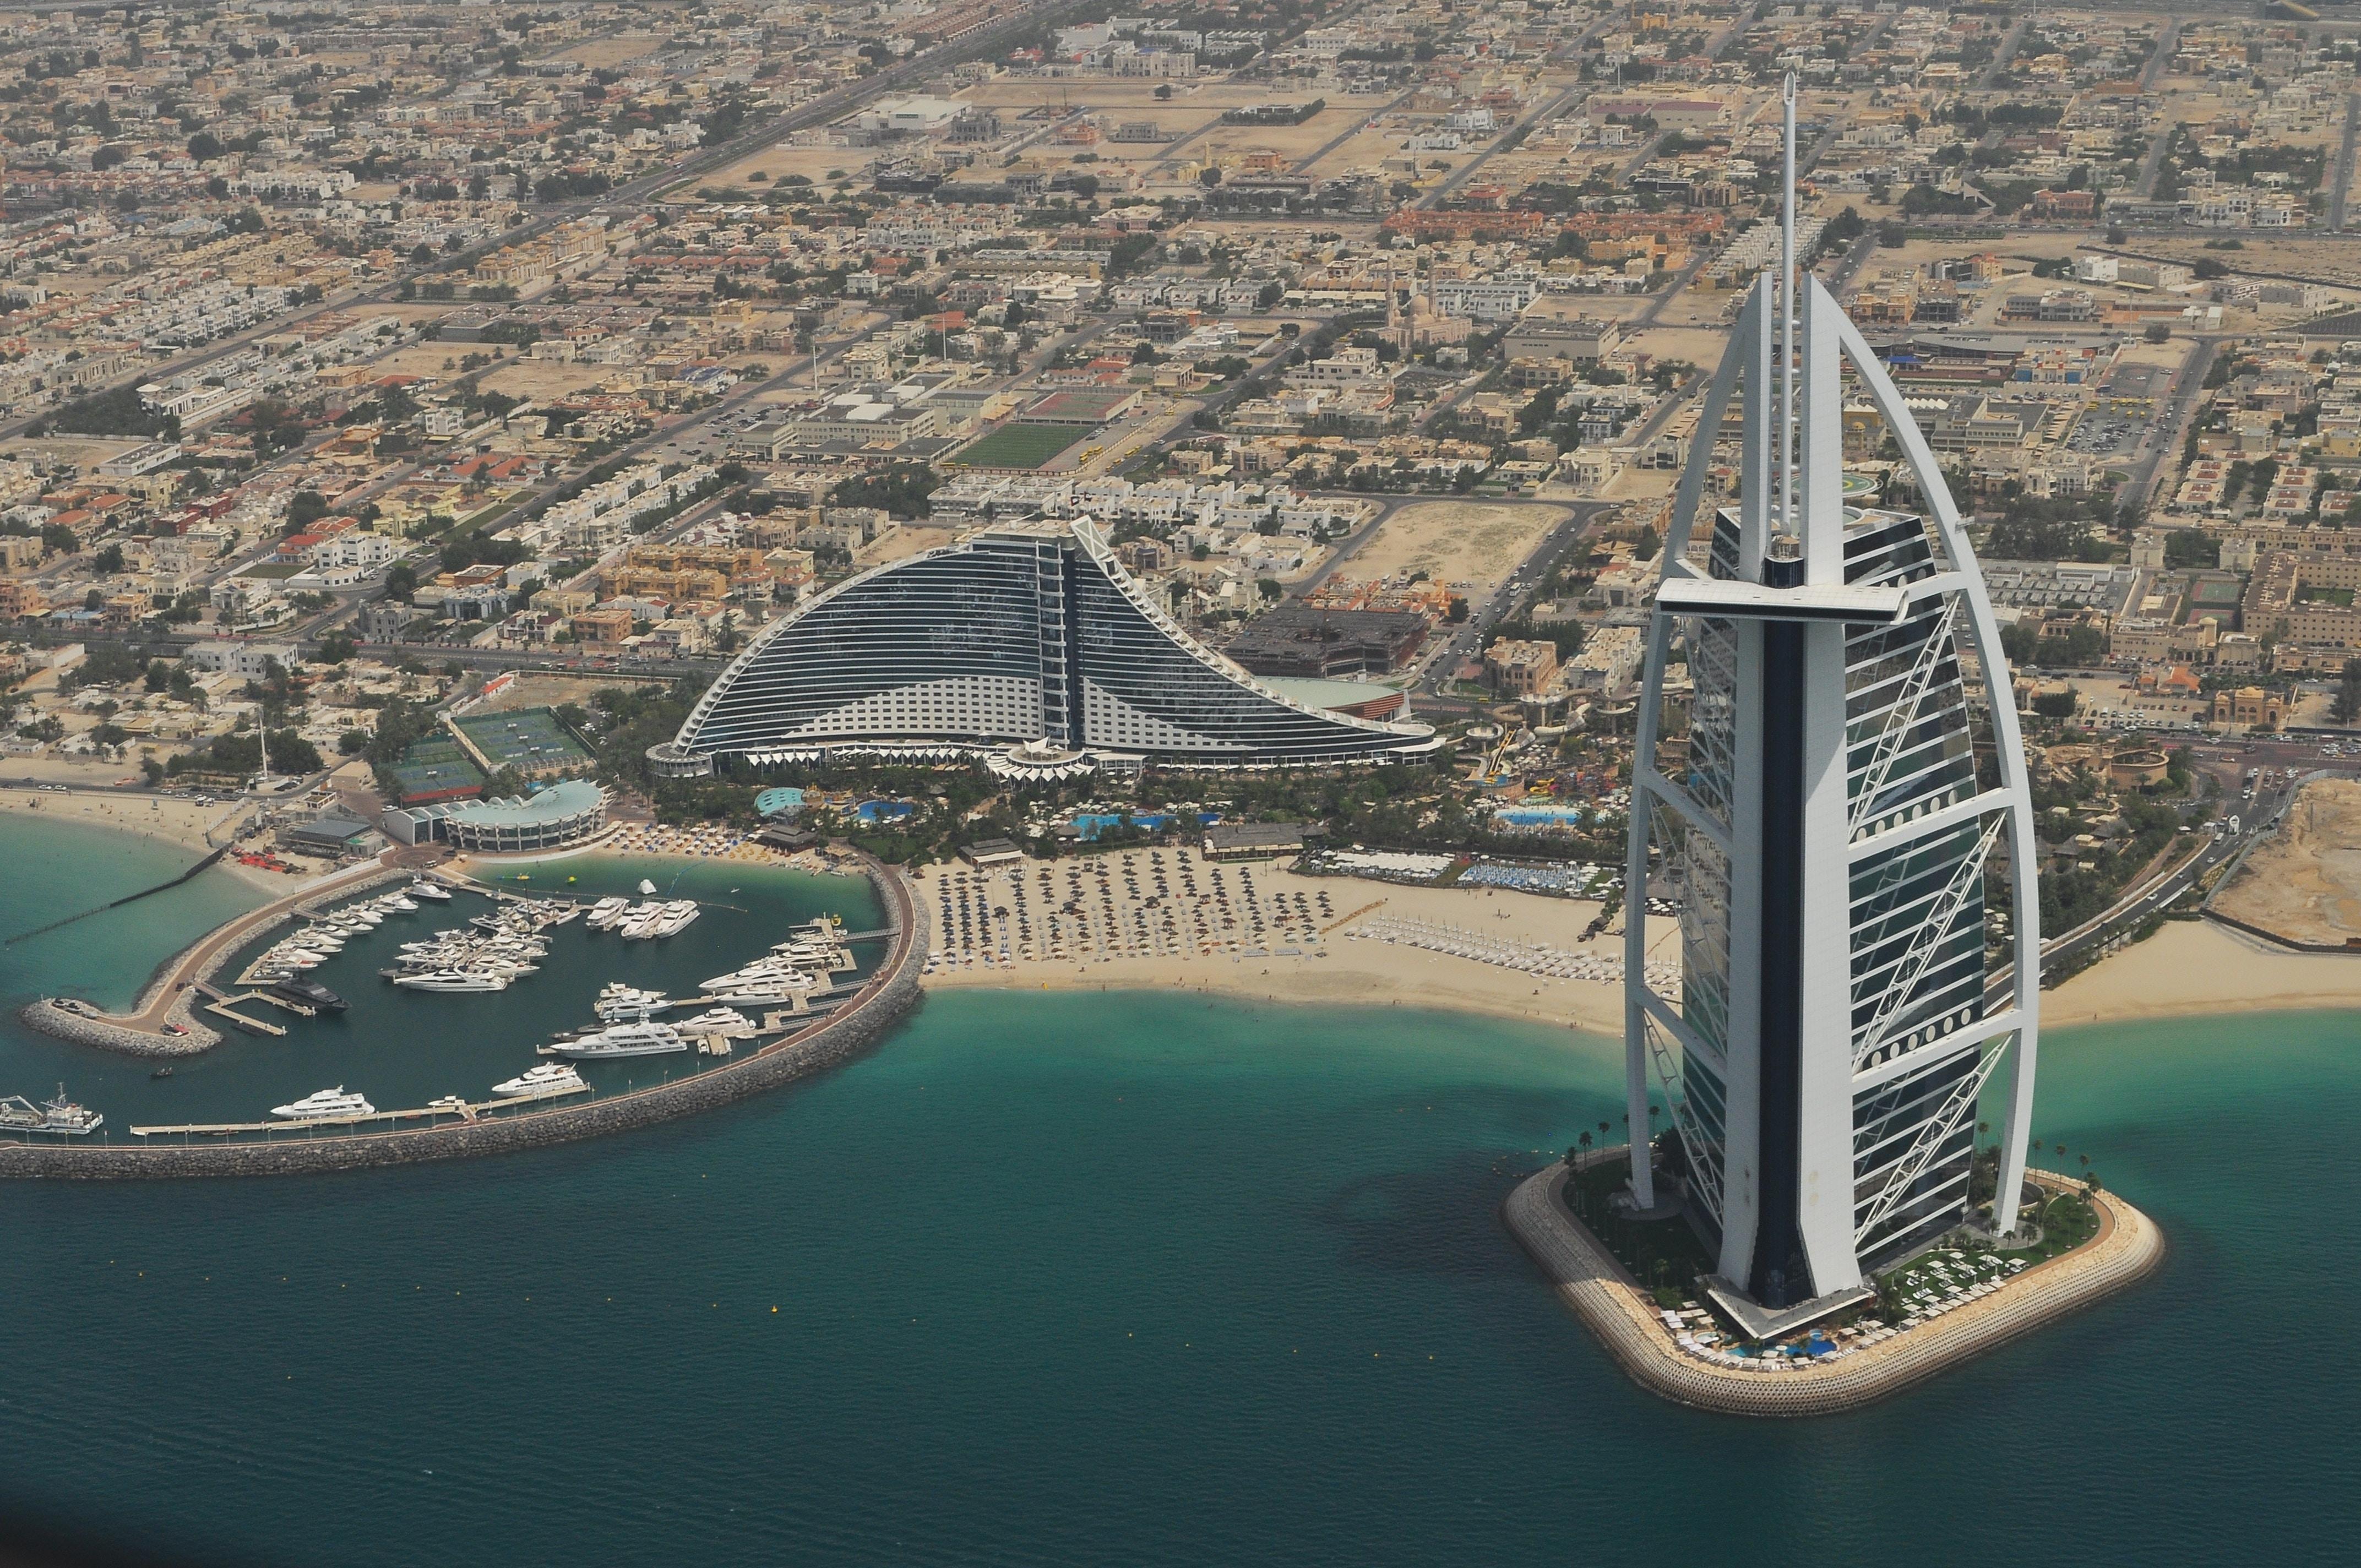 V Dubaї vperše u sviti tryvalisť kontrolju na kordoni tryvatyme 15 sek